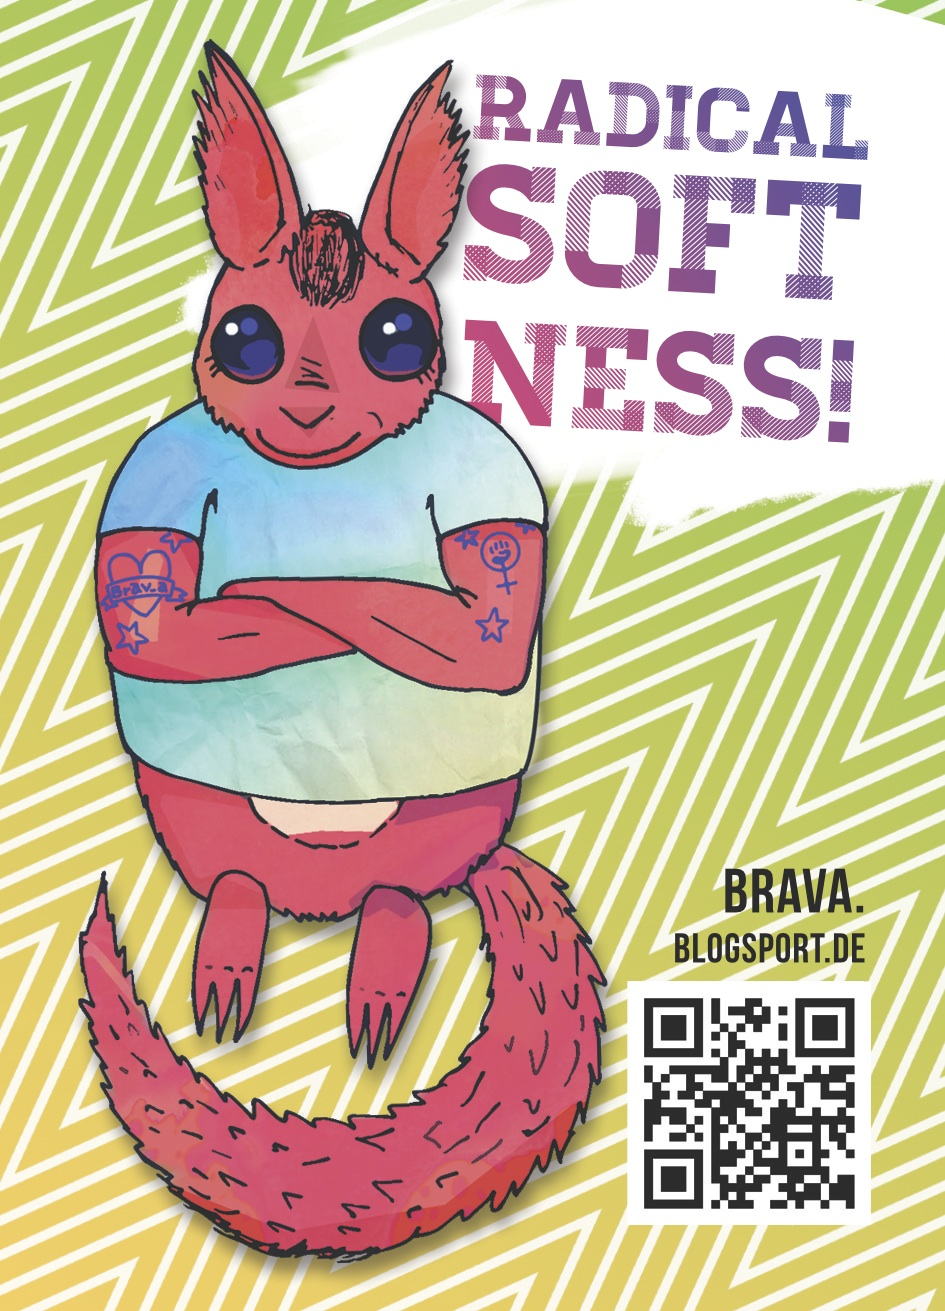 Brav_a-Sticker: Radical Softness